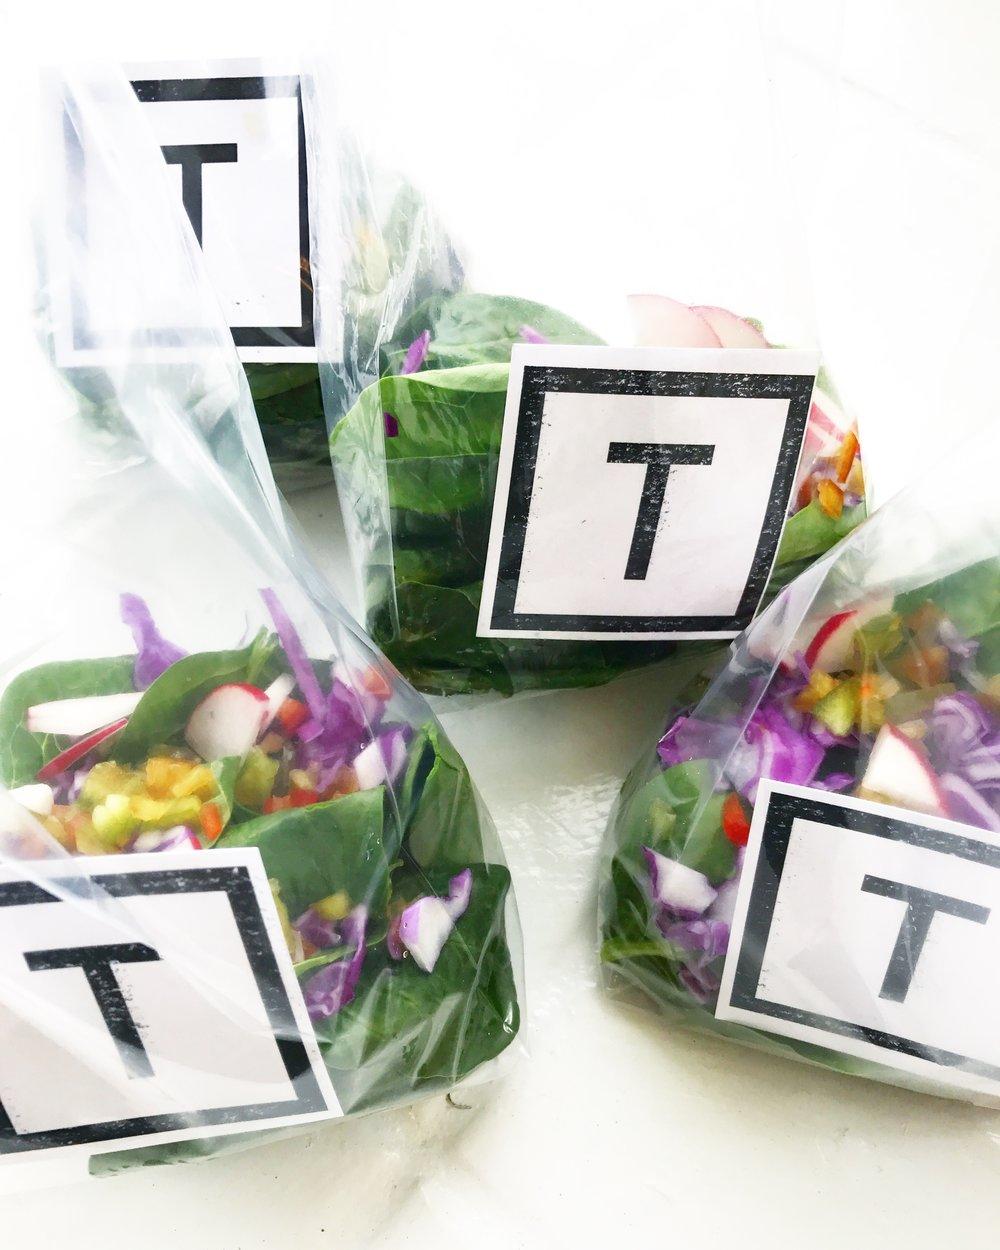 101316_Tomgirl Salad Greens.jpg